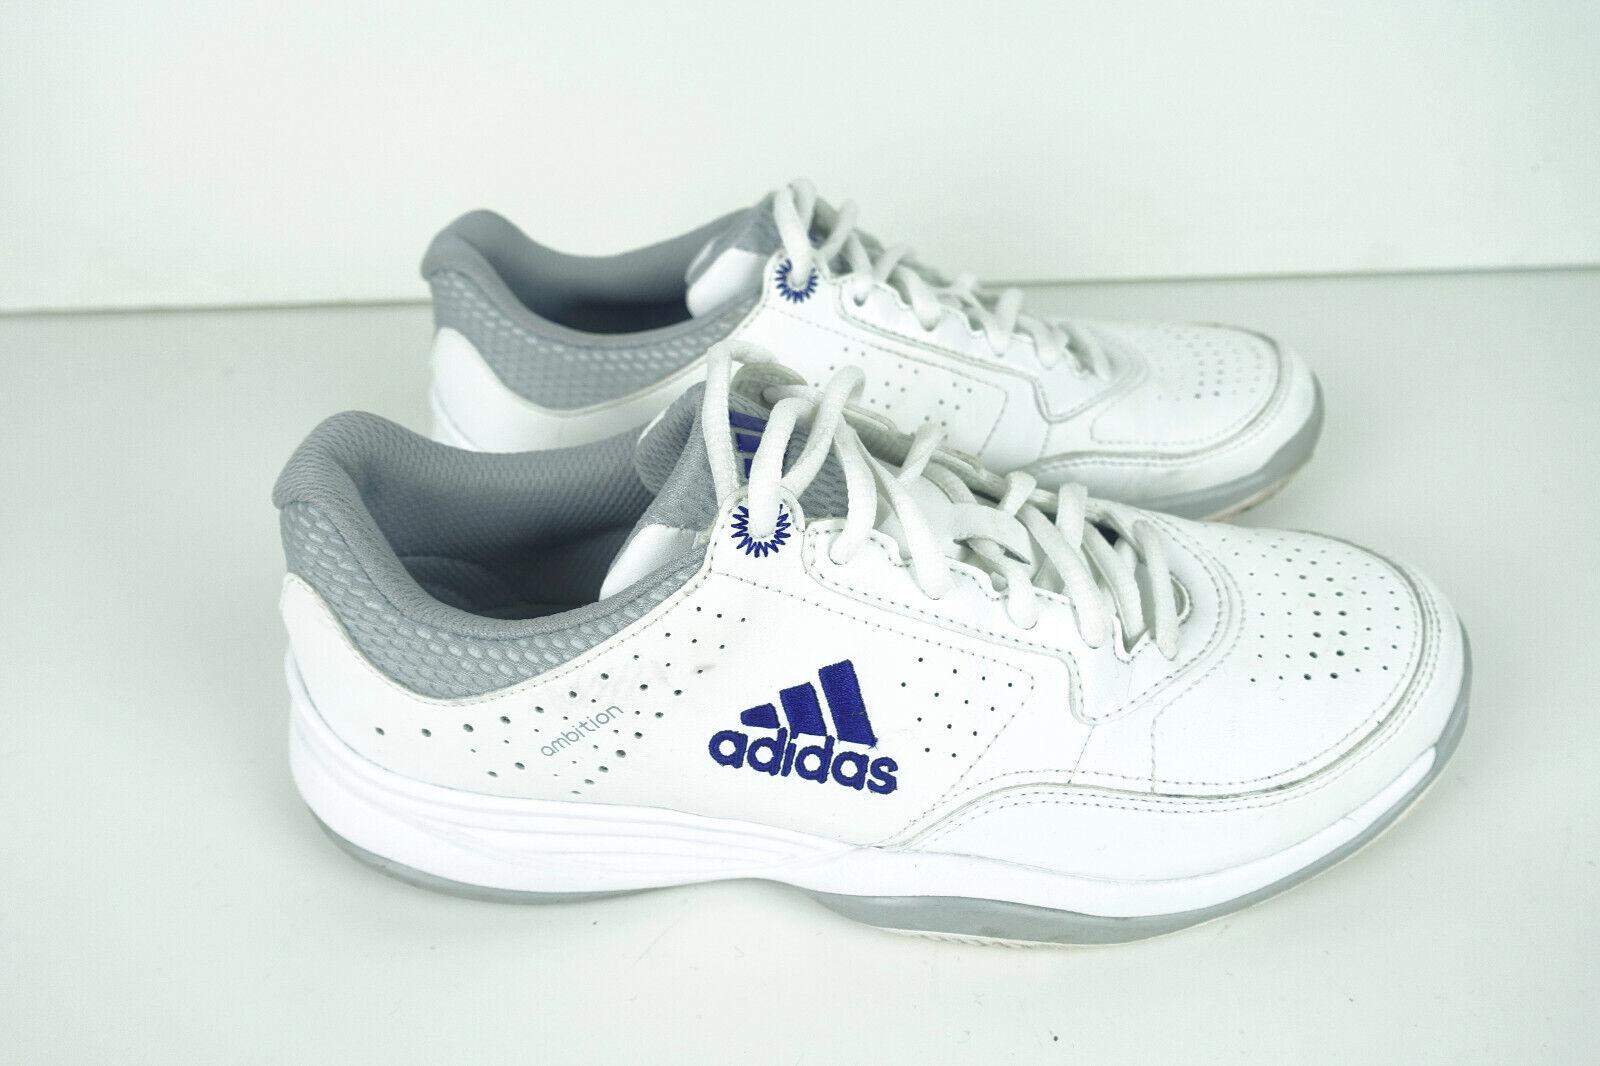 adidas Size 6 1/2 CourtSet Trainers